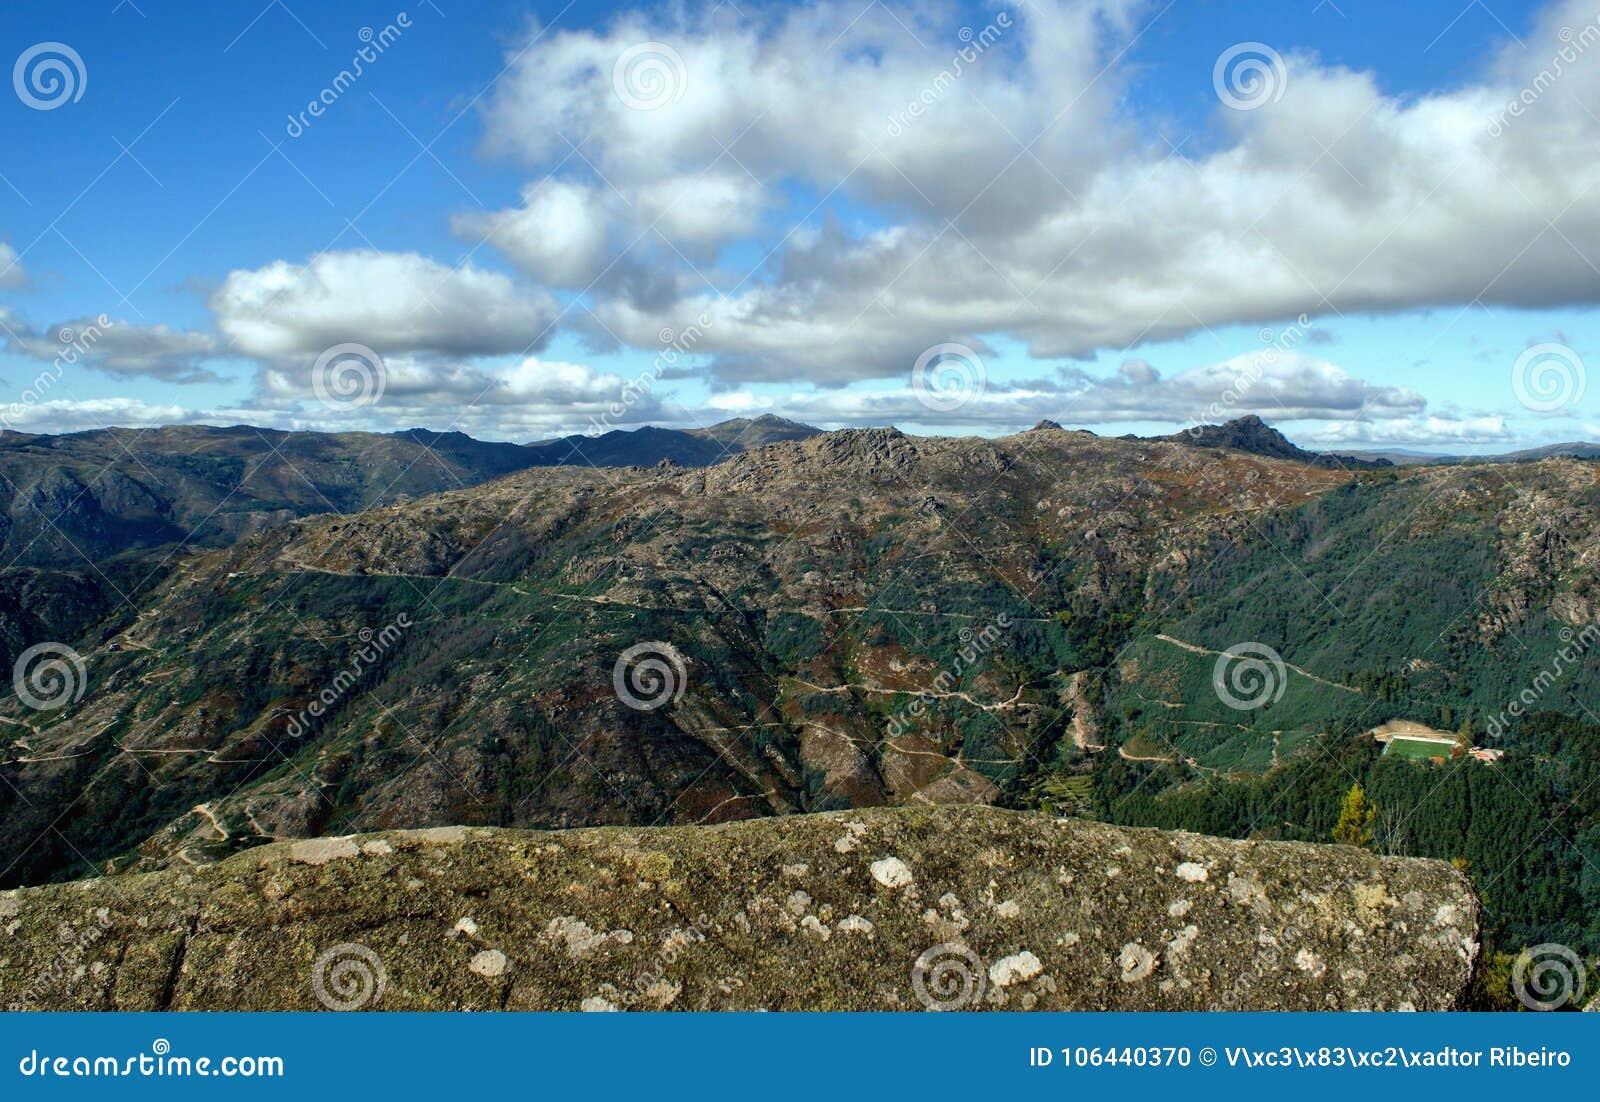 Peneda Geres国家公园风景看法